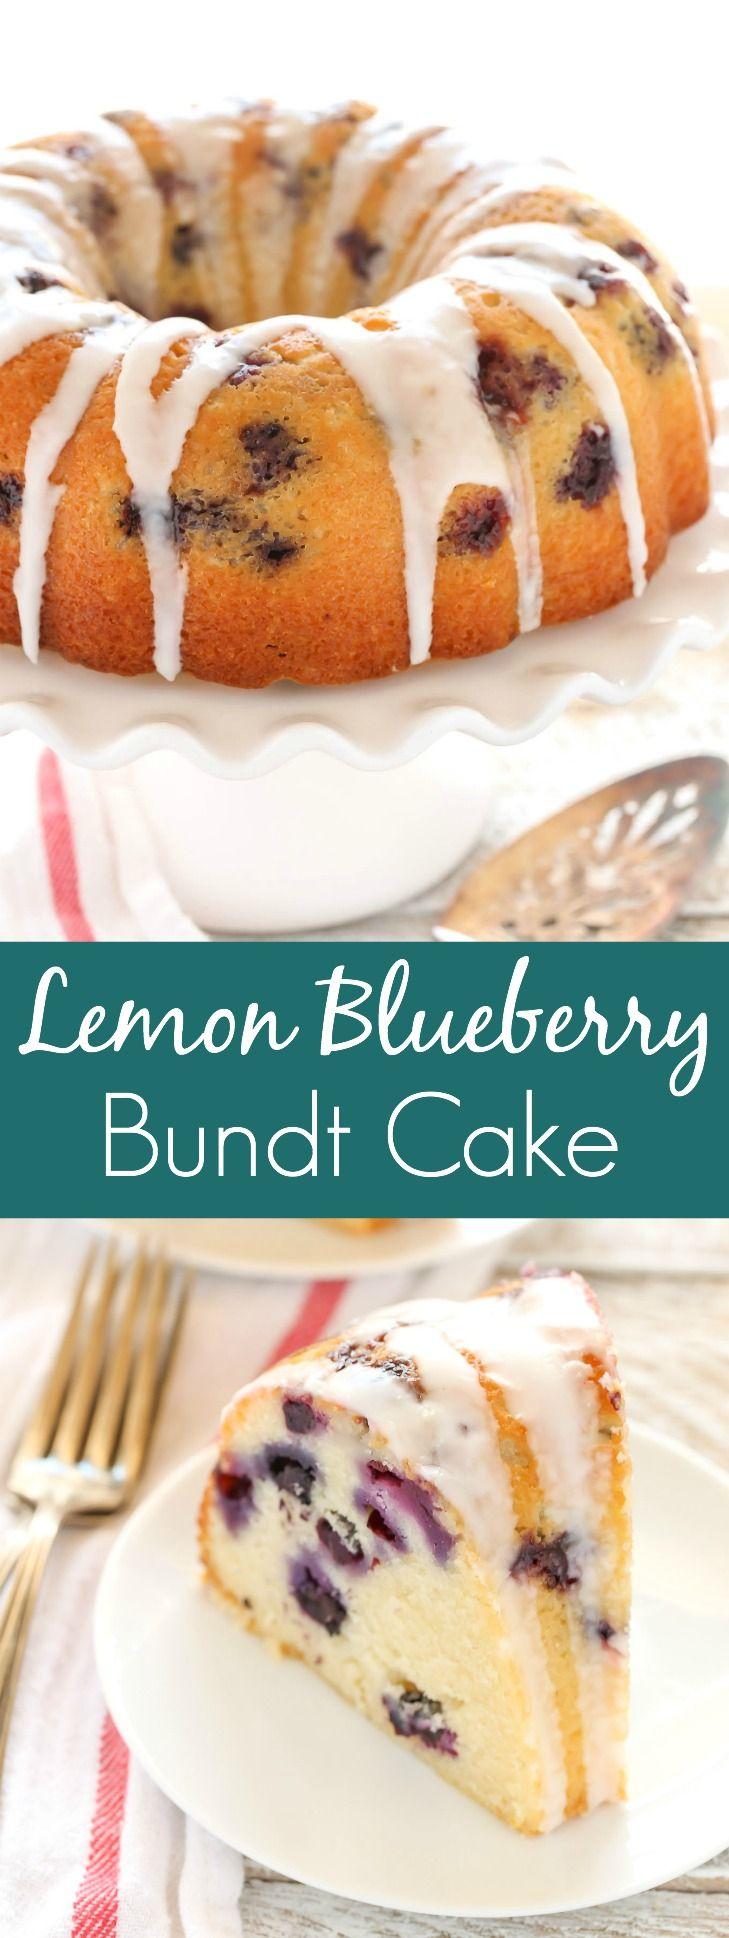 A moist lemon bundt cake filled with fresh blueberries and topped with a sweet lemon glaze. This Lemon Blueberry Bundt Cake is a perfect dessert for lemon lovers!